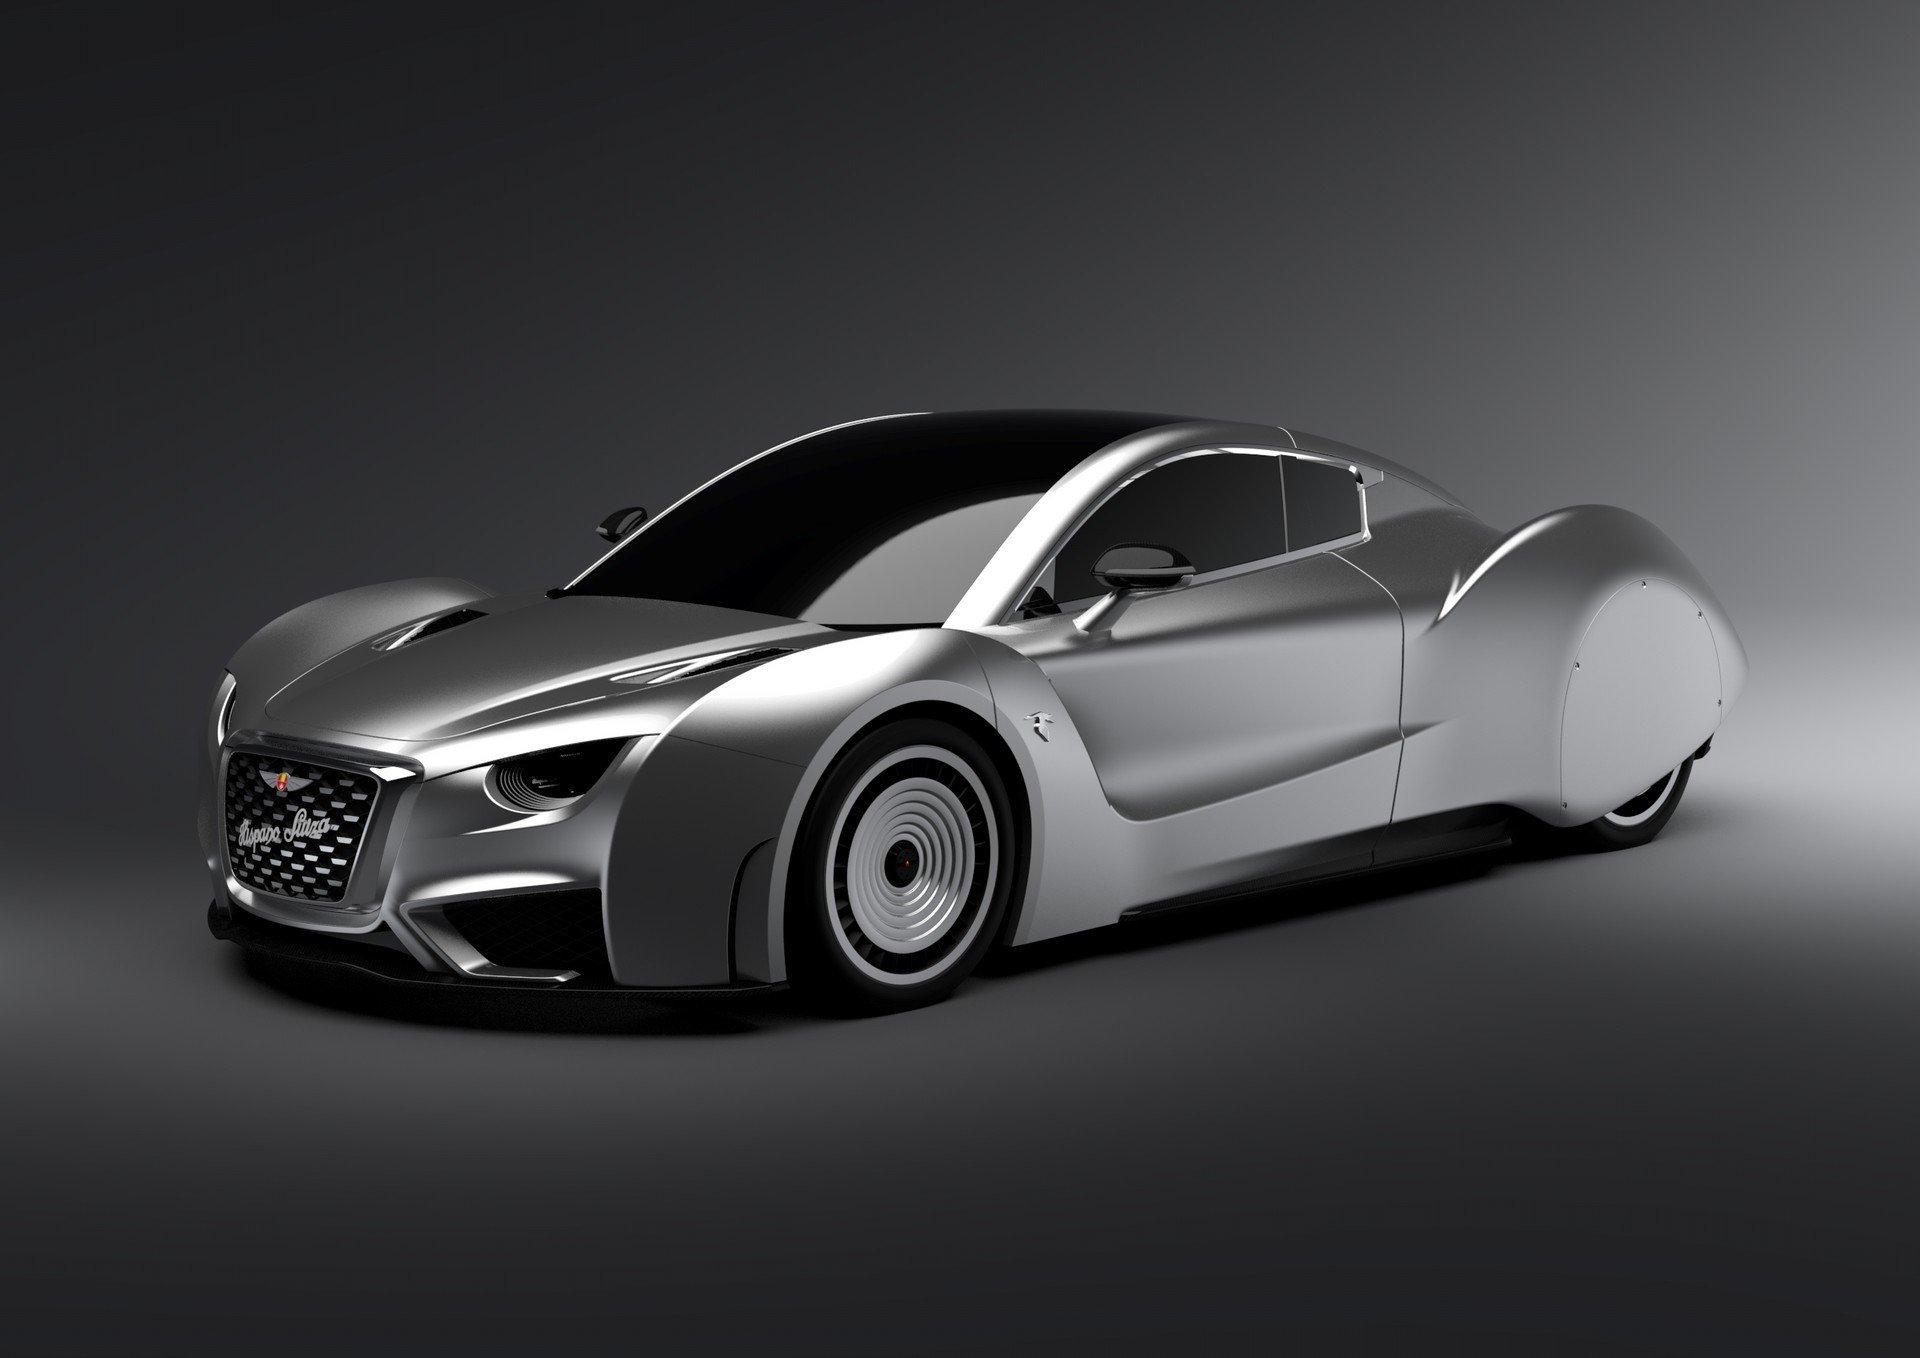 Hispano Suiza покажет новое электрокупе в Женеве